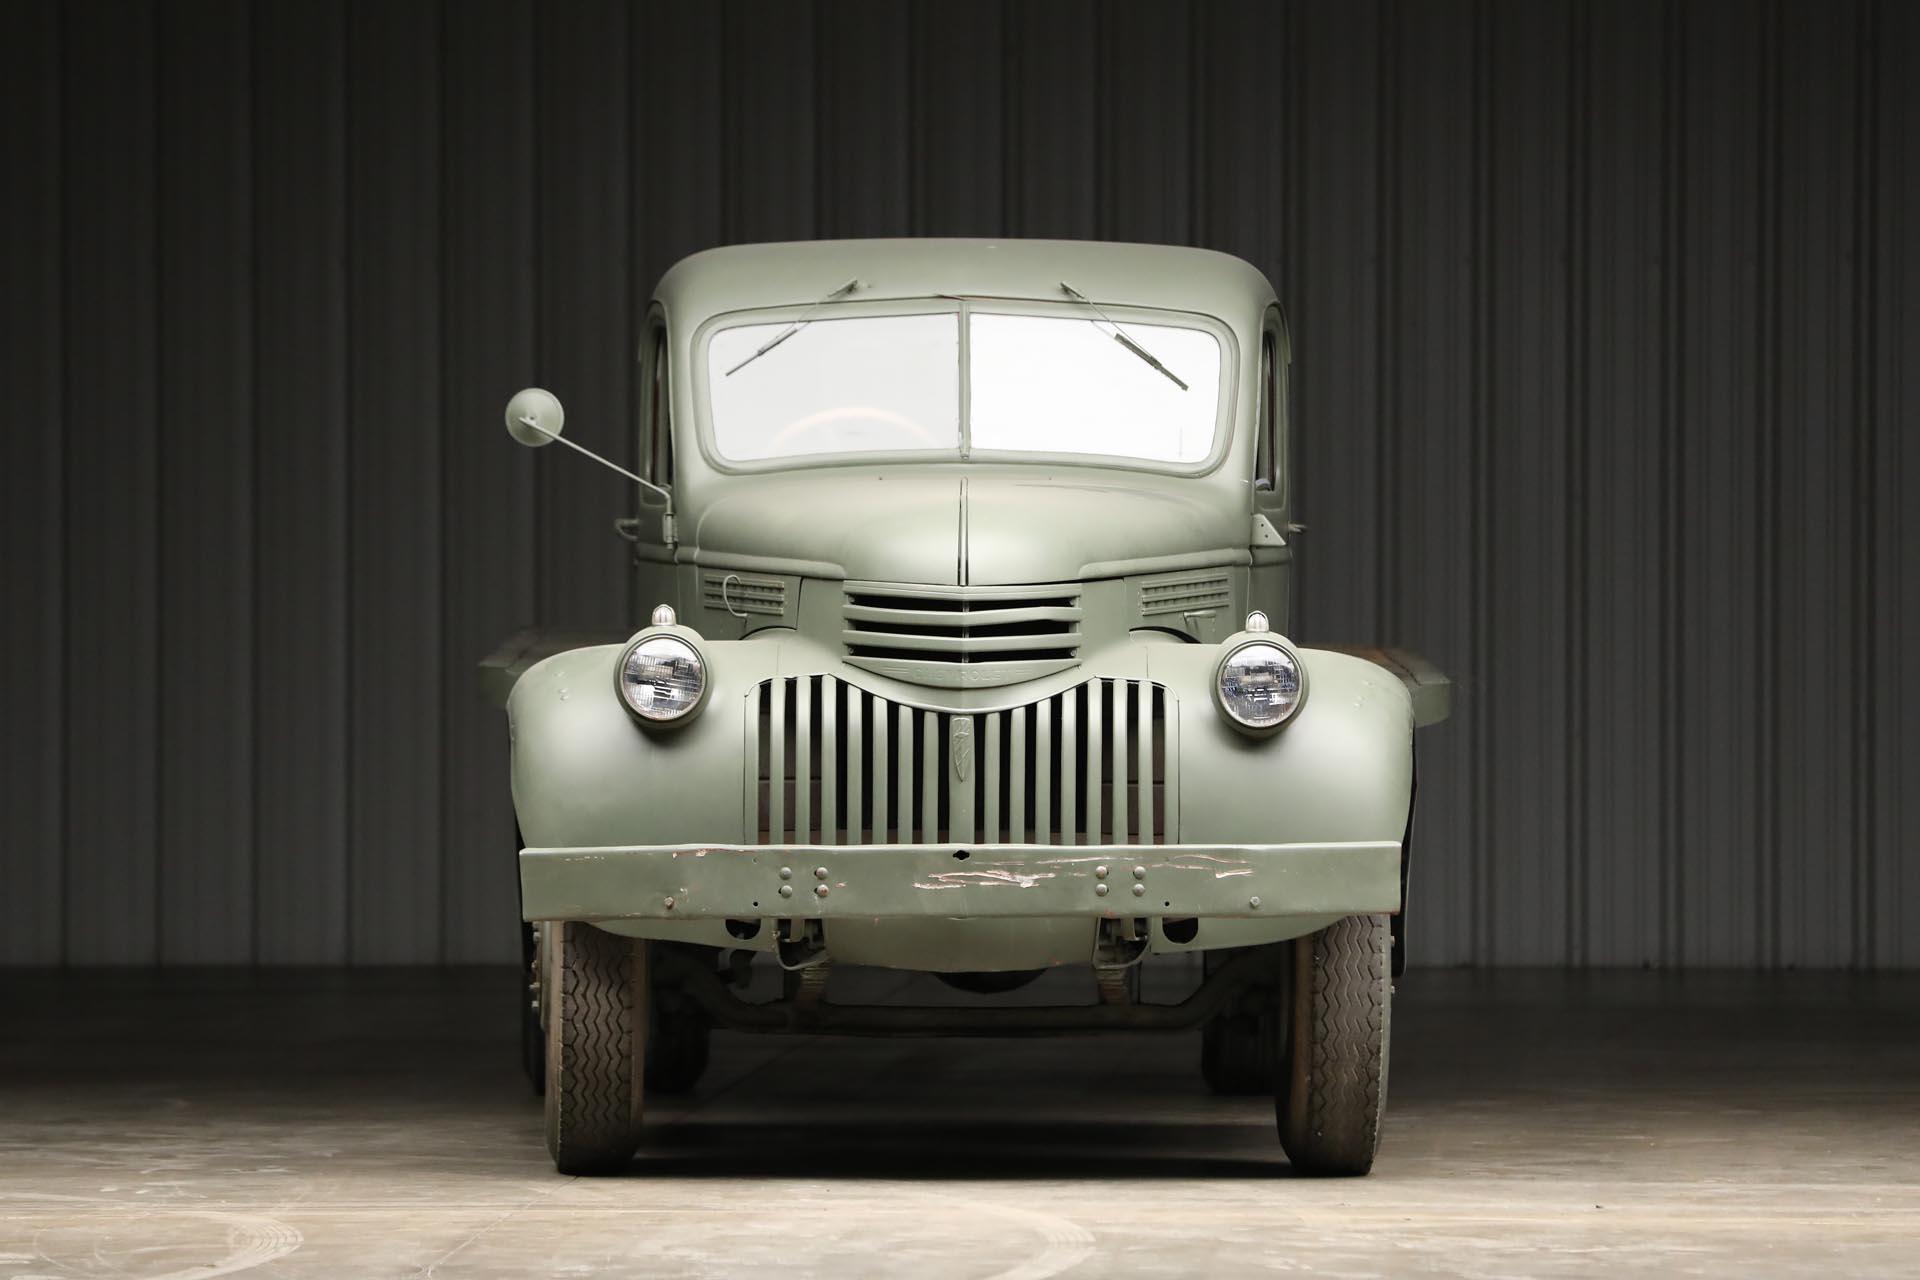 1941 Chevrolet 1543 GS Front